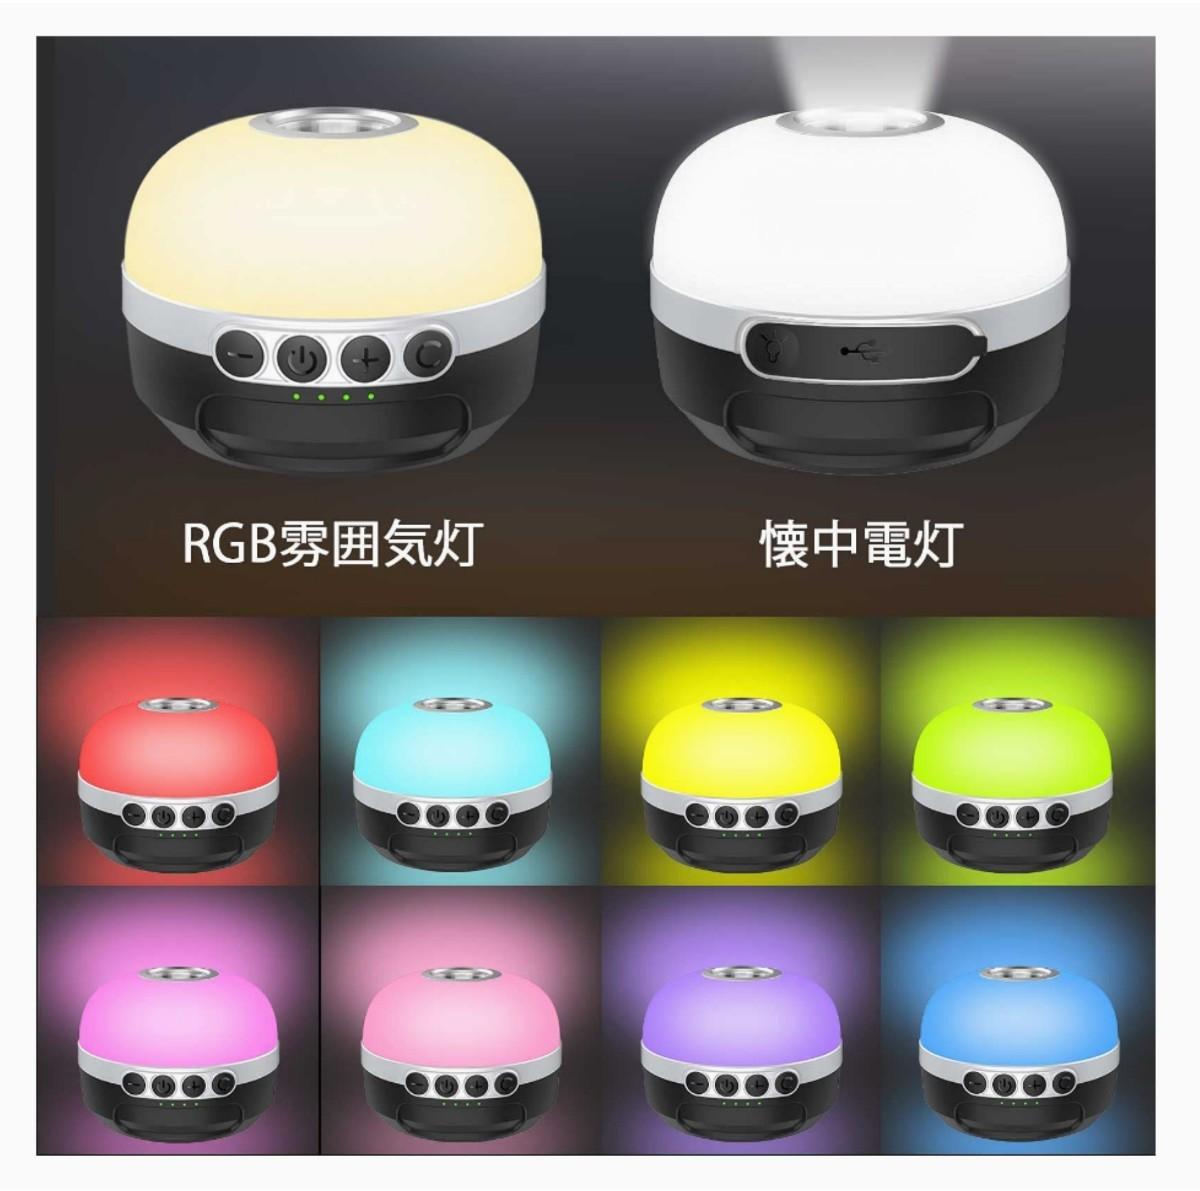 LEDランタン 充電式 懐中電灯 USB Type-C充電 キャンプ アウトドア